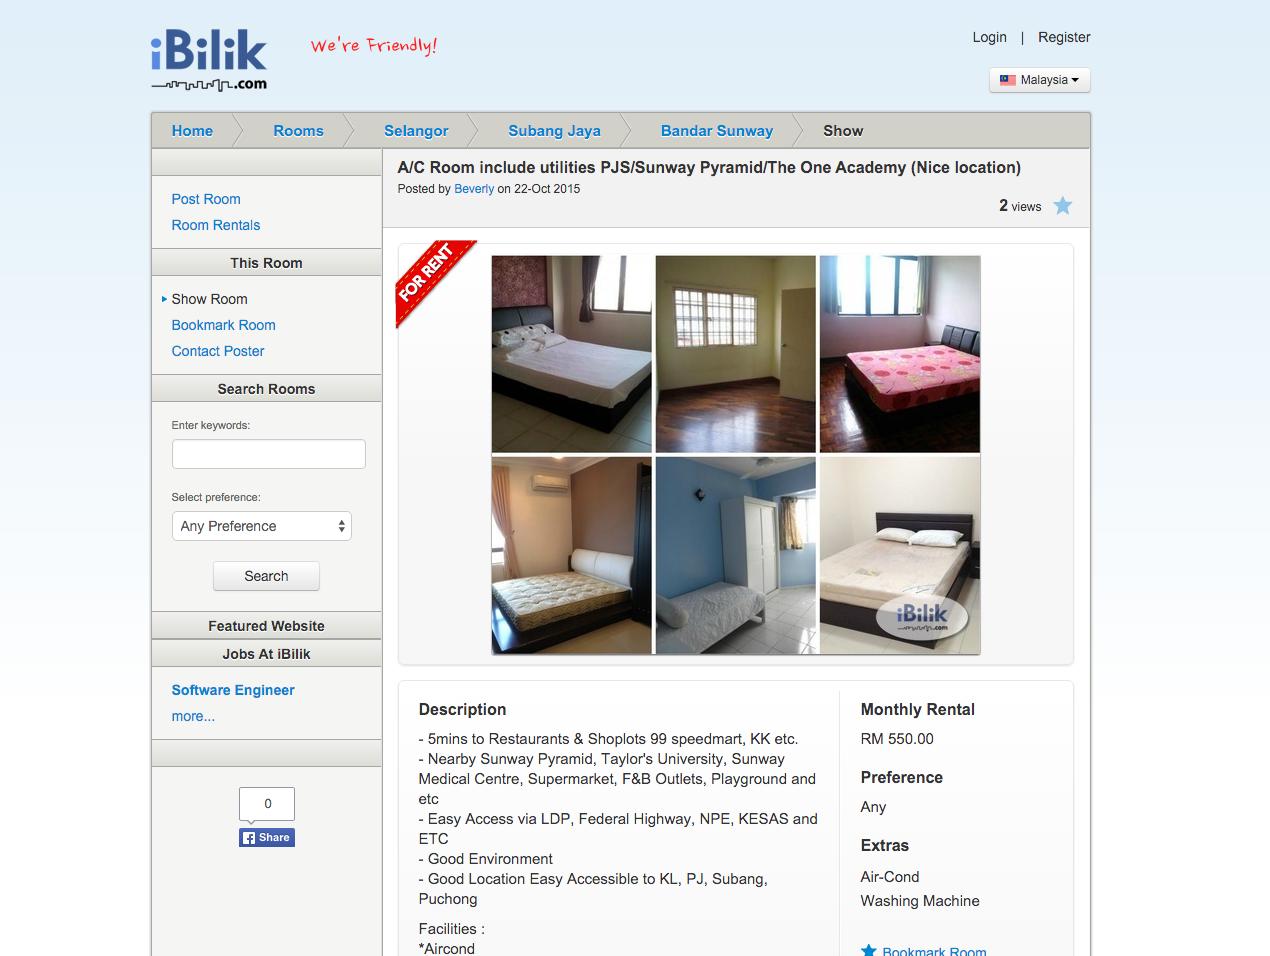 Image from iBilik